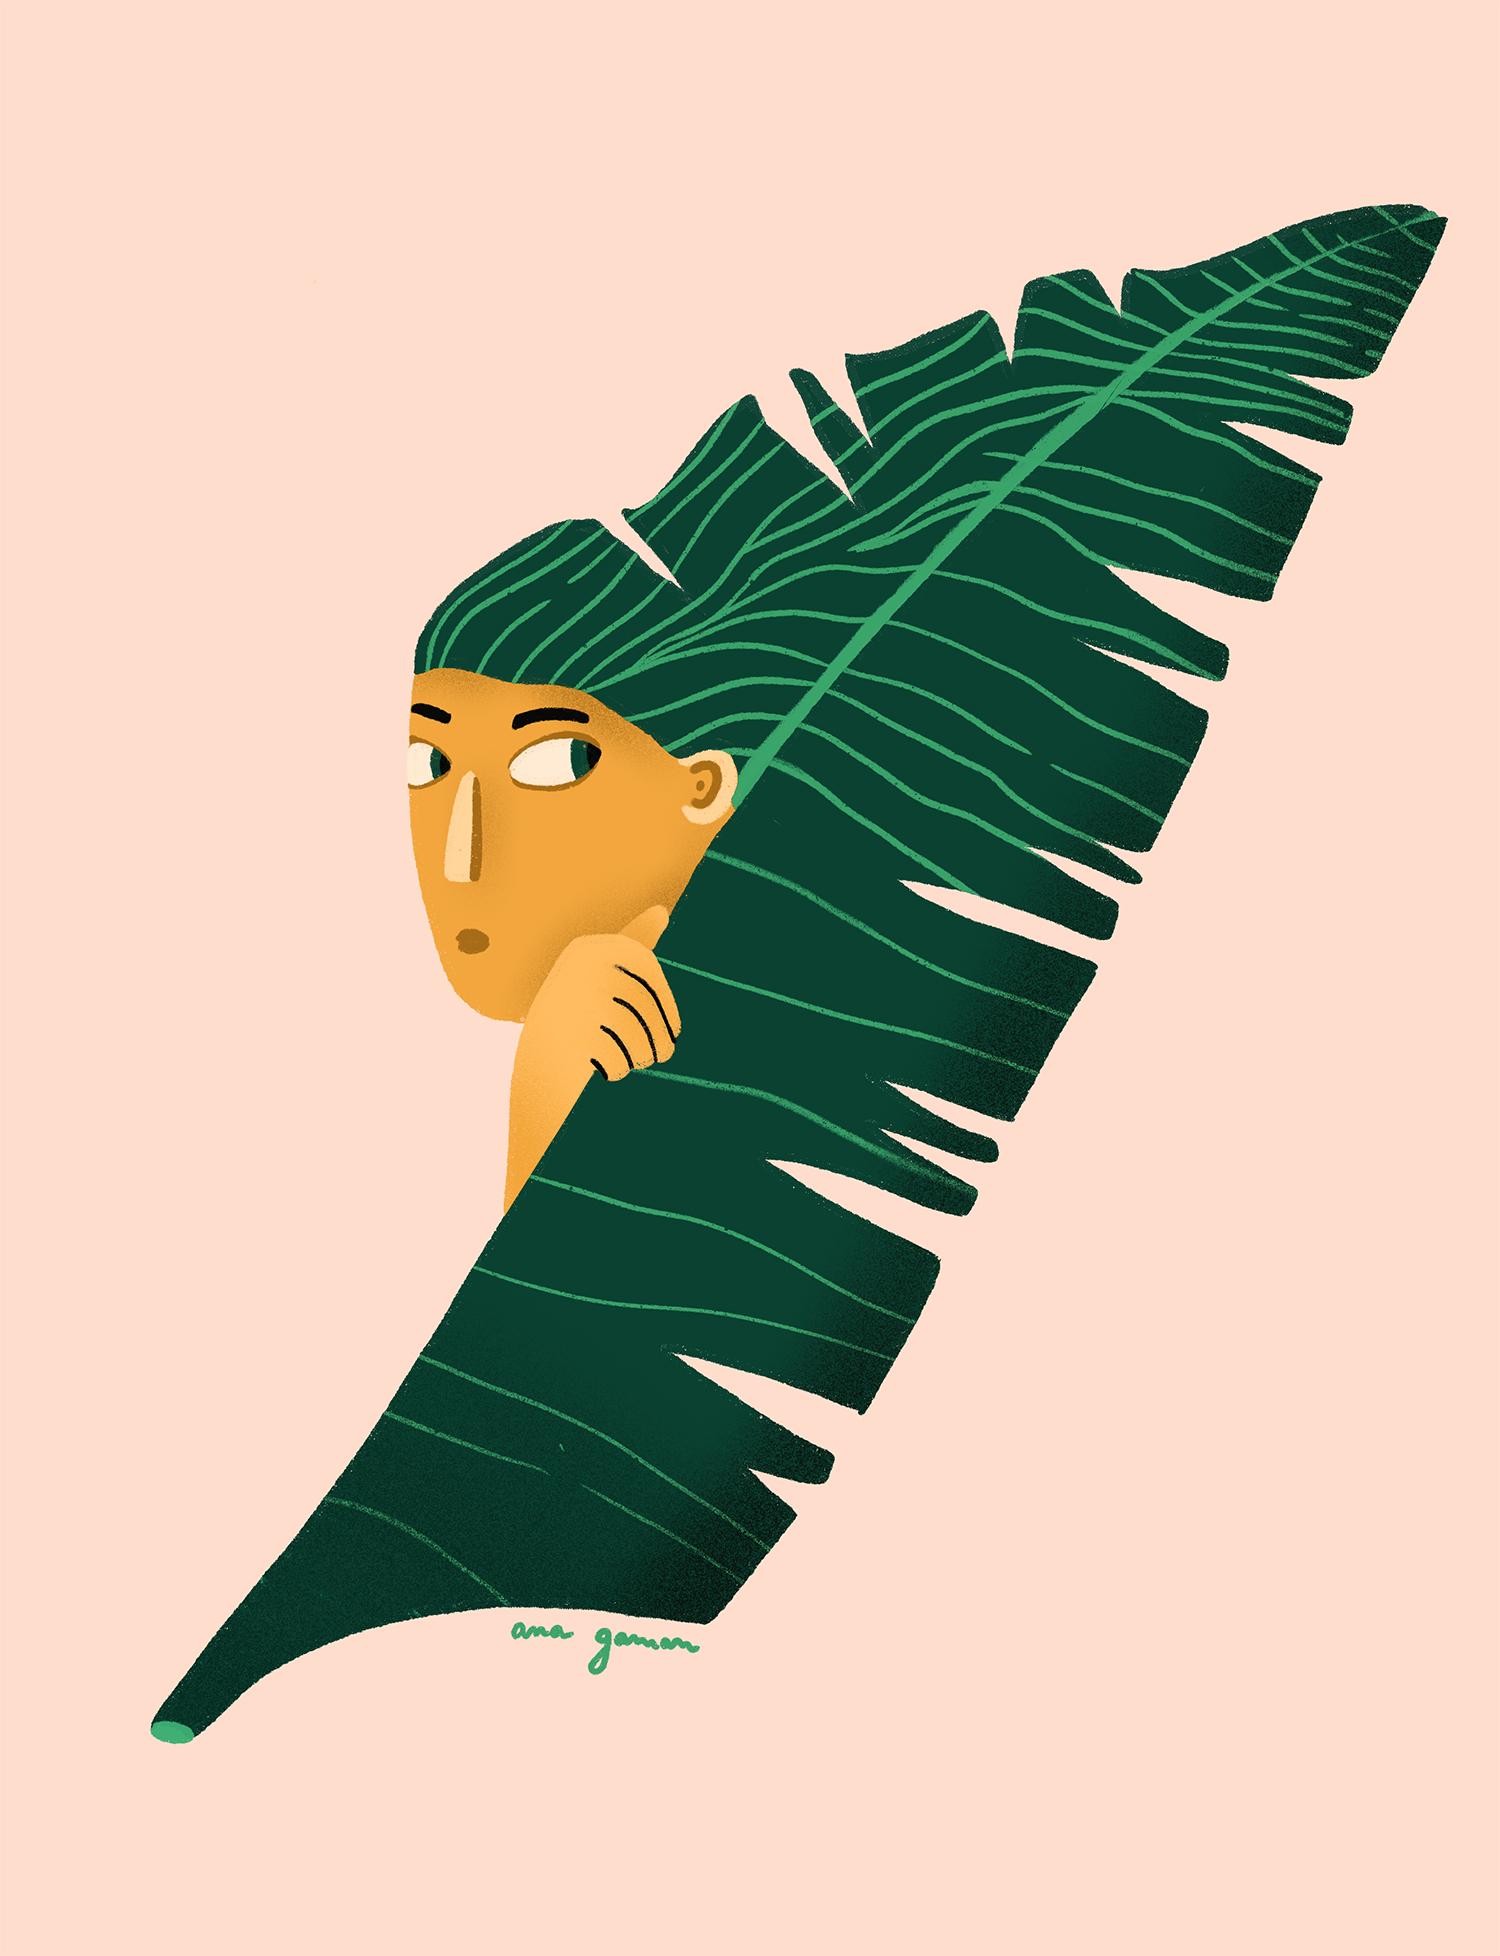 Ana Gaman illustration girl under leaf